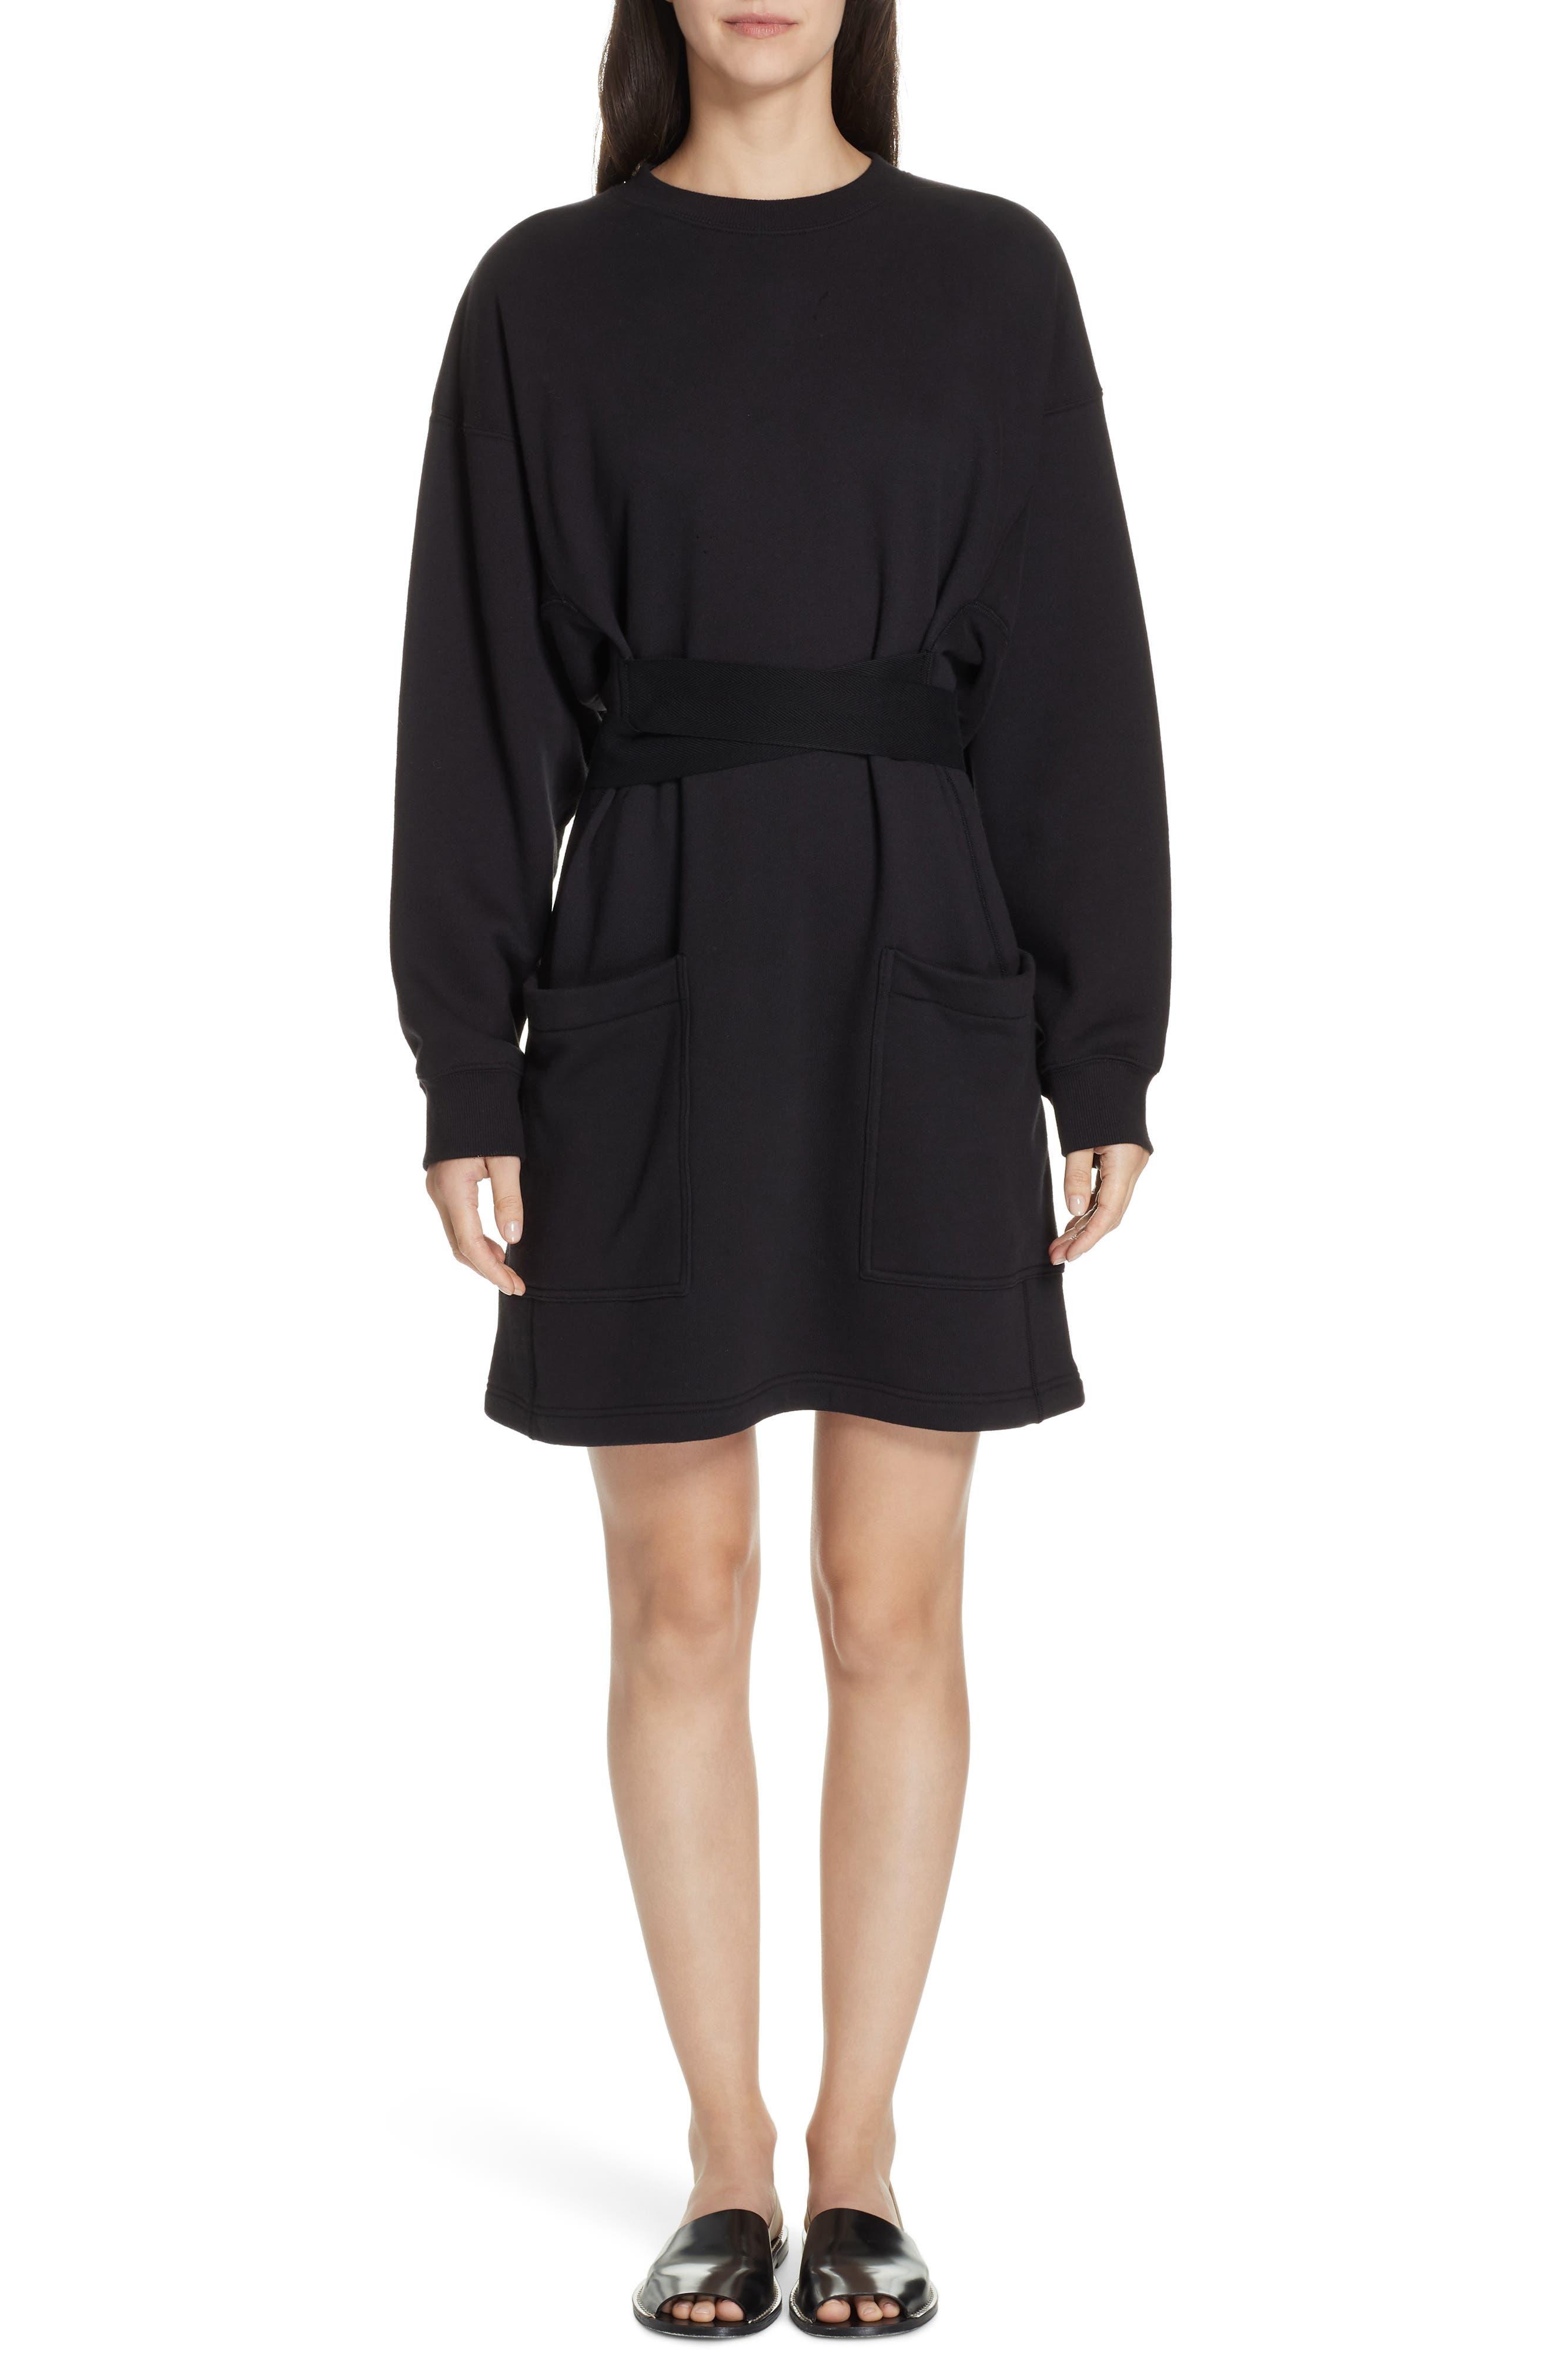 PSWL Belted Sweatshirt Dress,                             Main thumbnail 1, color,                             BLACK